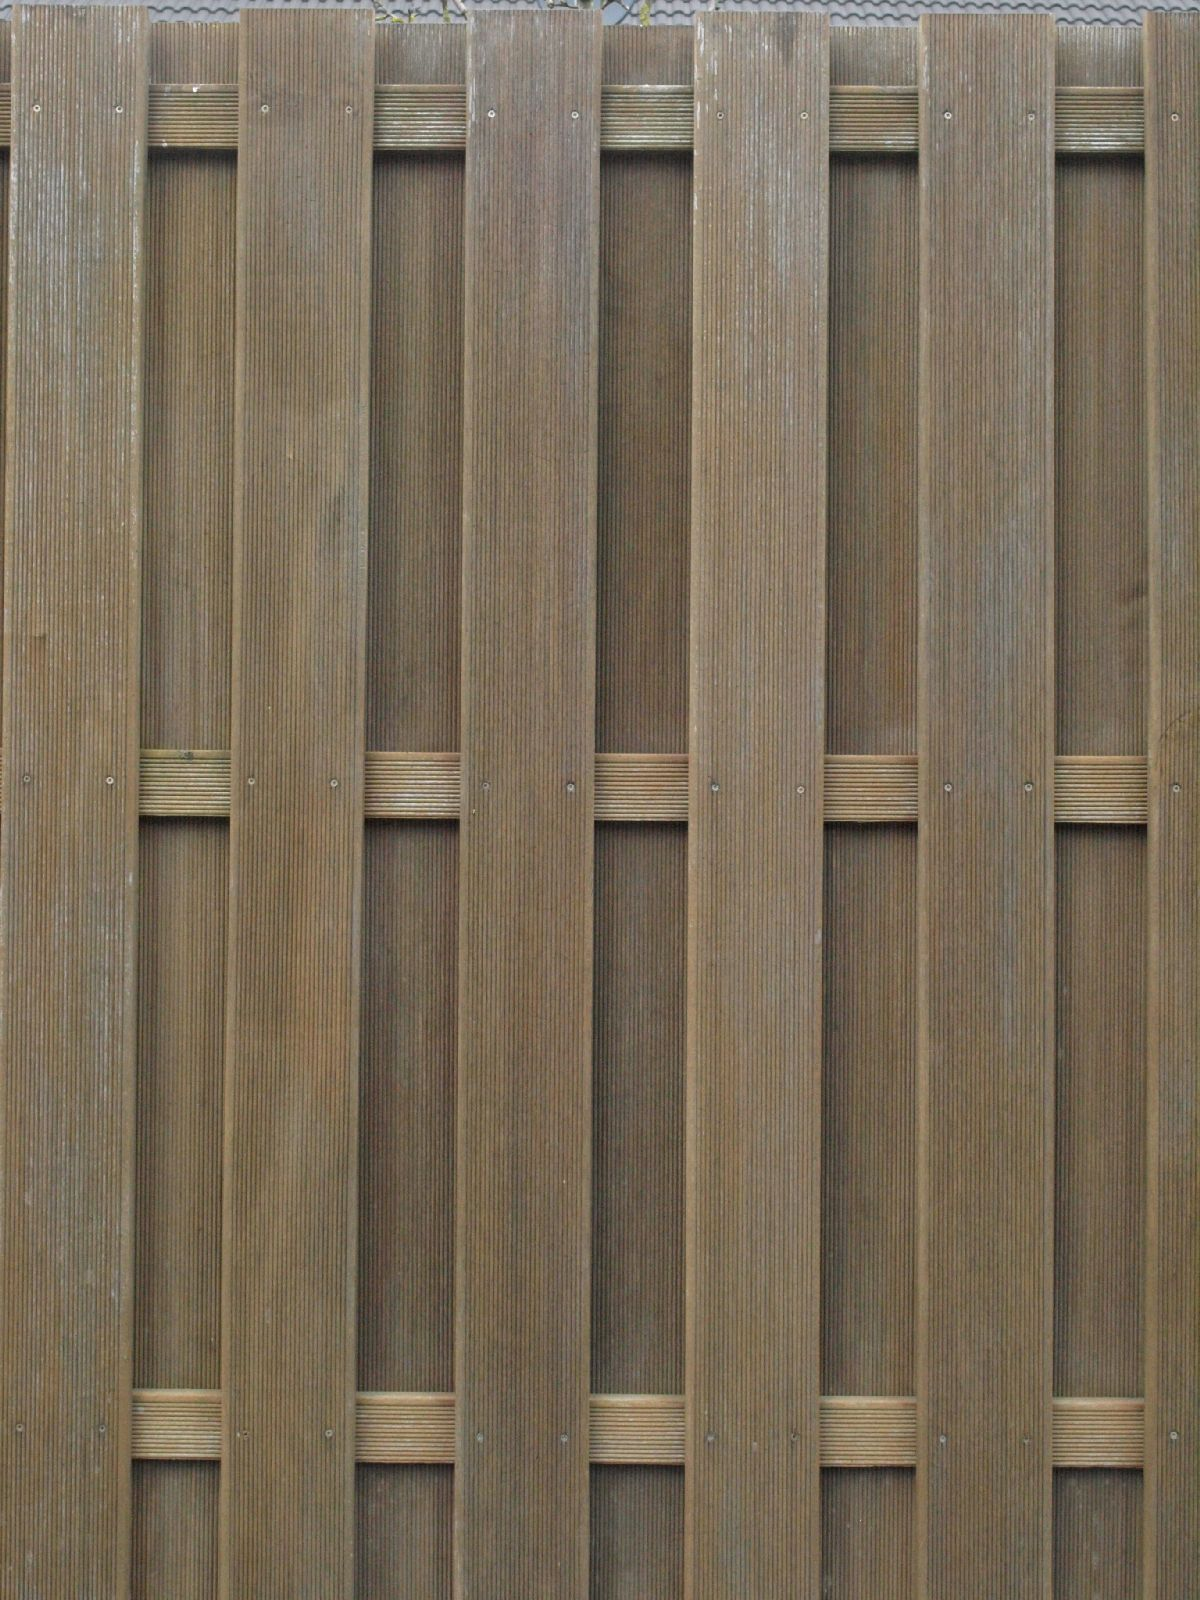 Wood_Texture_A_P3151345